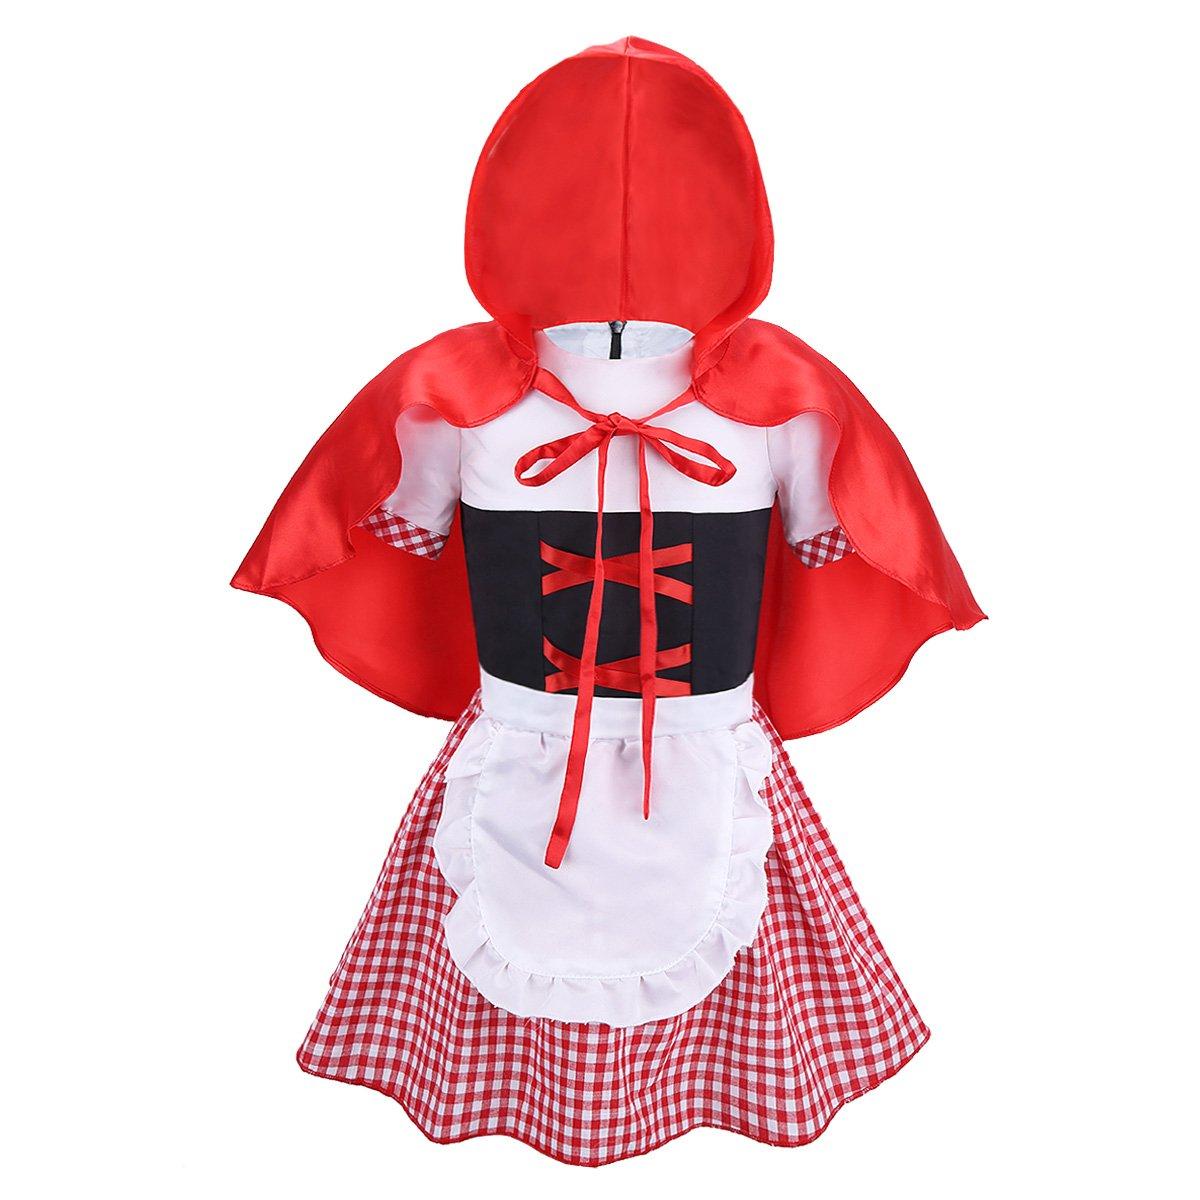 iiniim Baby Girls Halloween Party Costumes Short Sleeves Dress with Hooded Cloak (18-24 Months) by iiniim (Image #1)